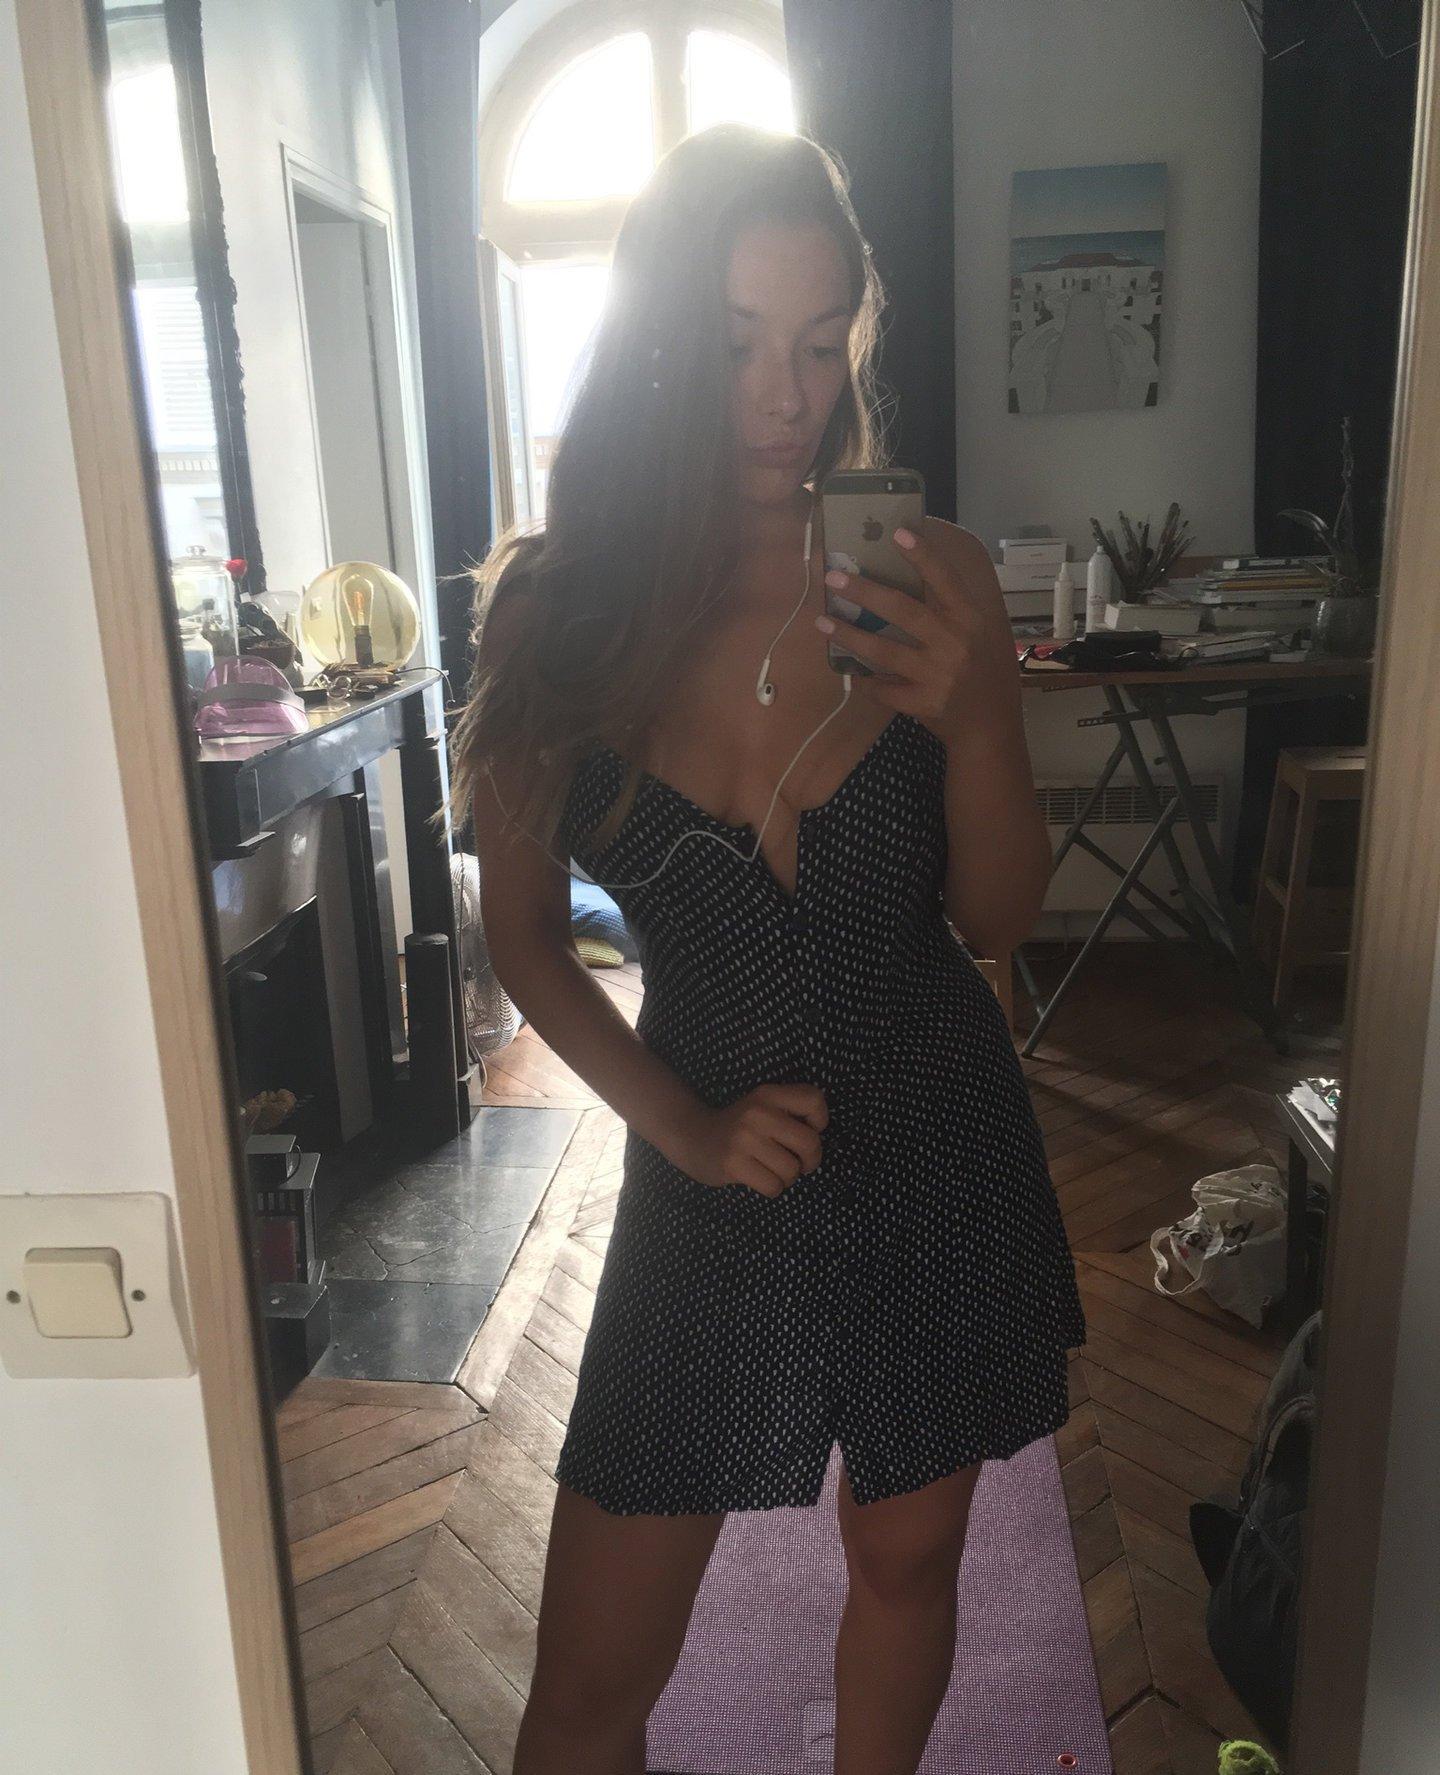 Olga Kobzar Bugs Bunny Gf Nudes Leaks 0088